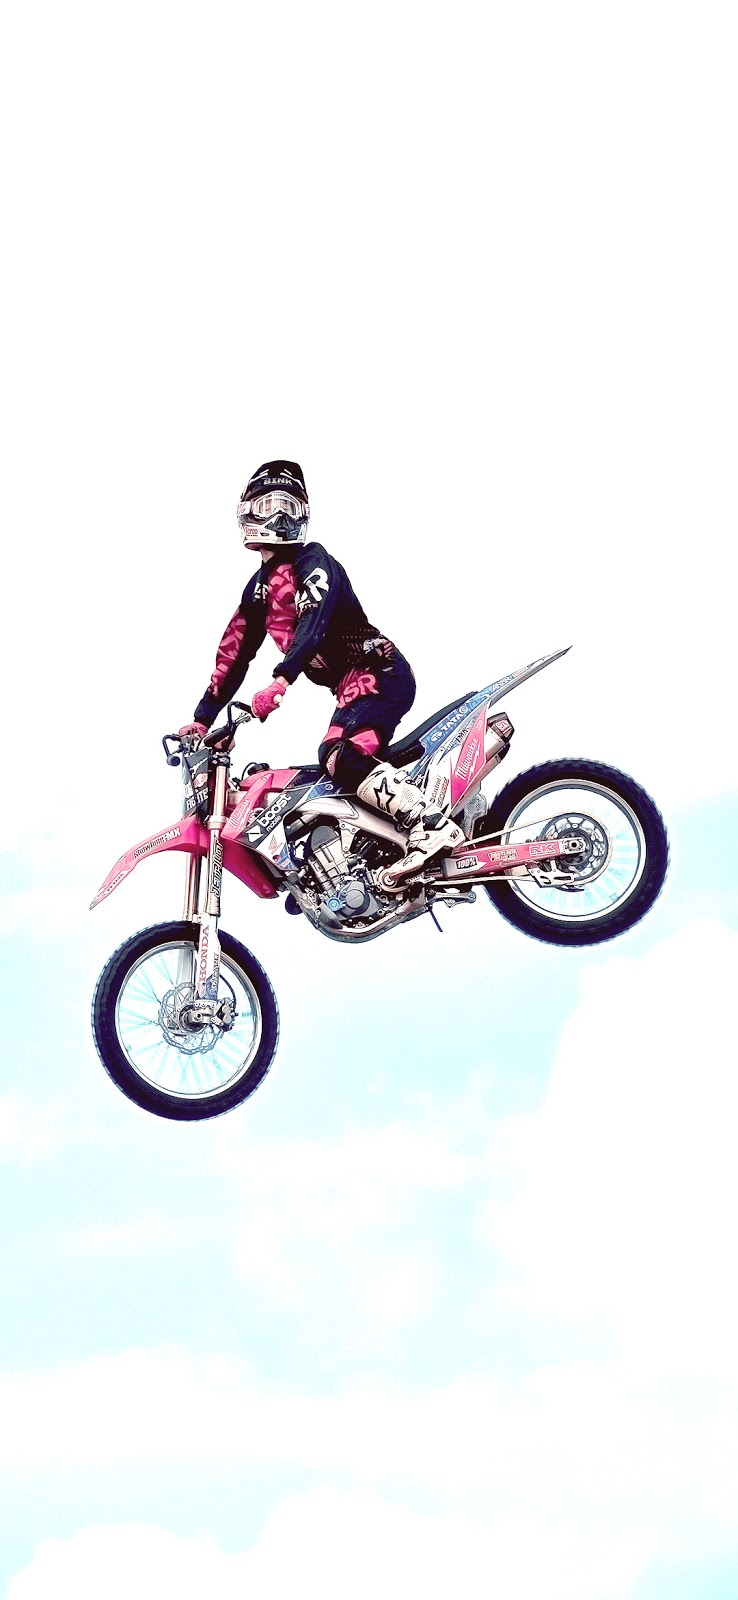 man riding dirt bike on air wallpaper